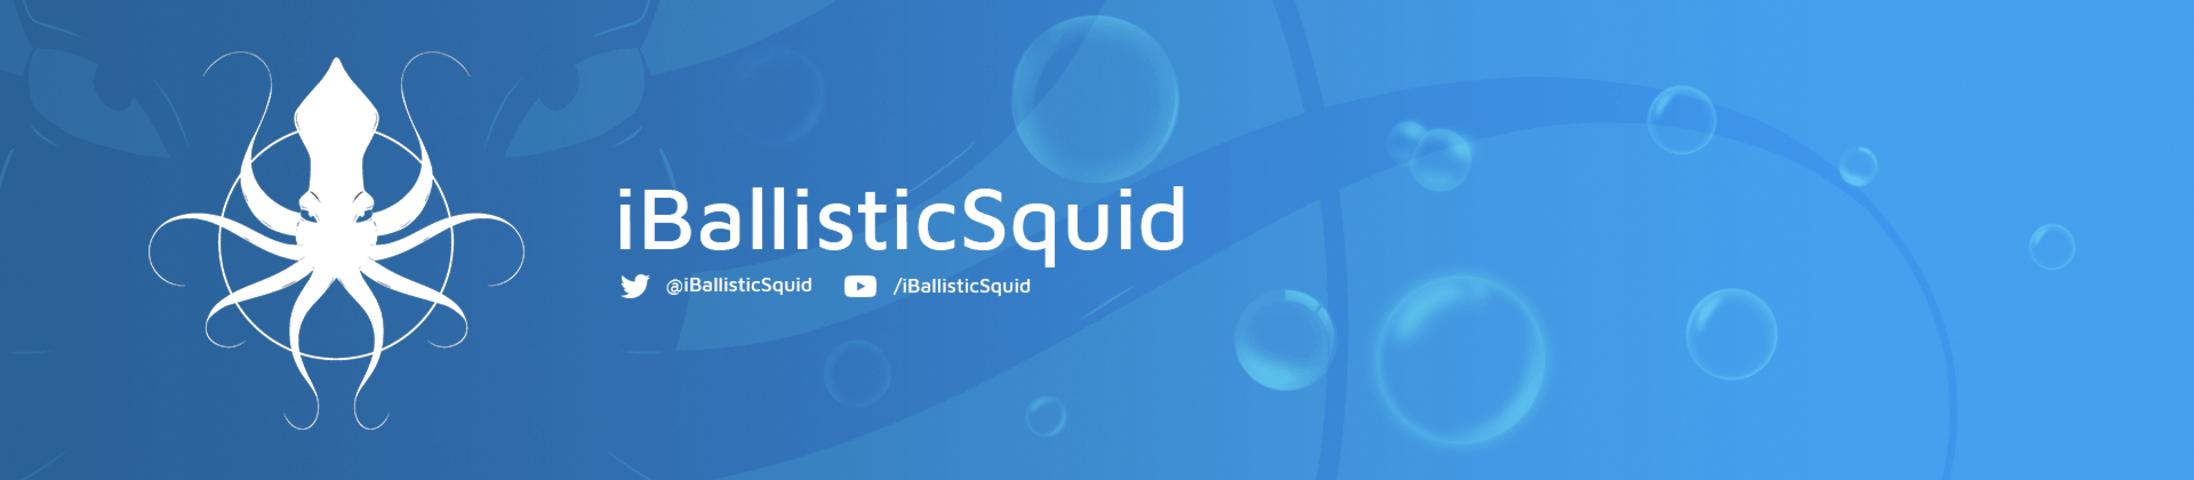 iBallisticSquid Logo - LogoDix